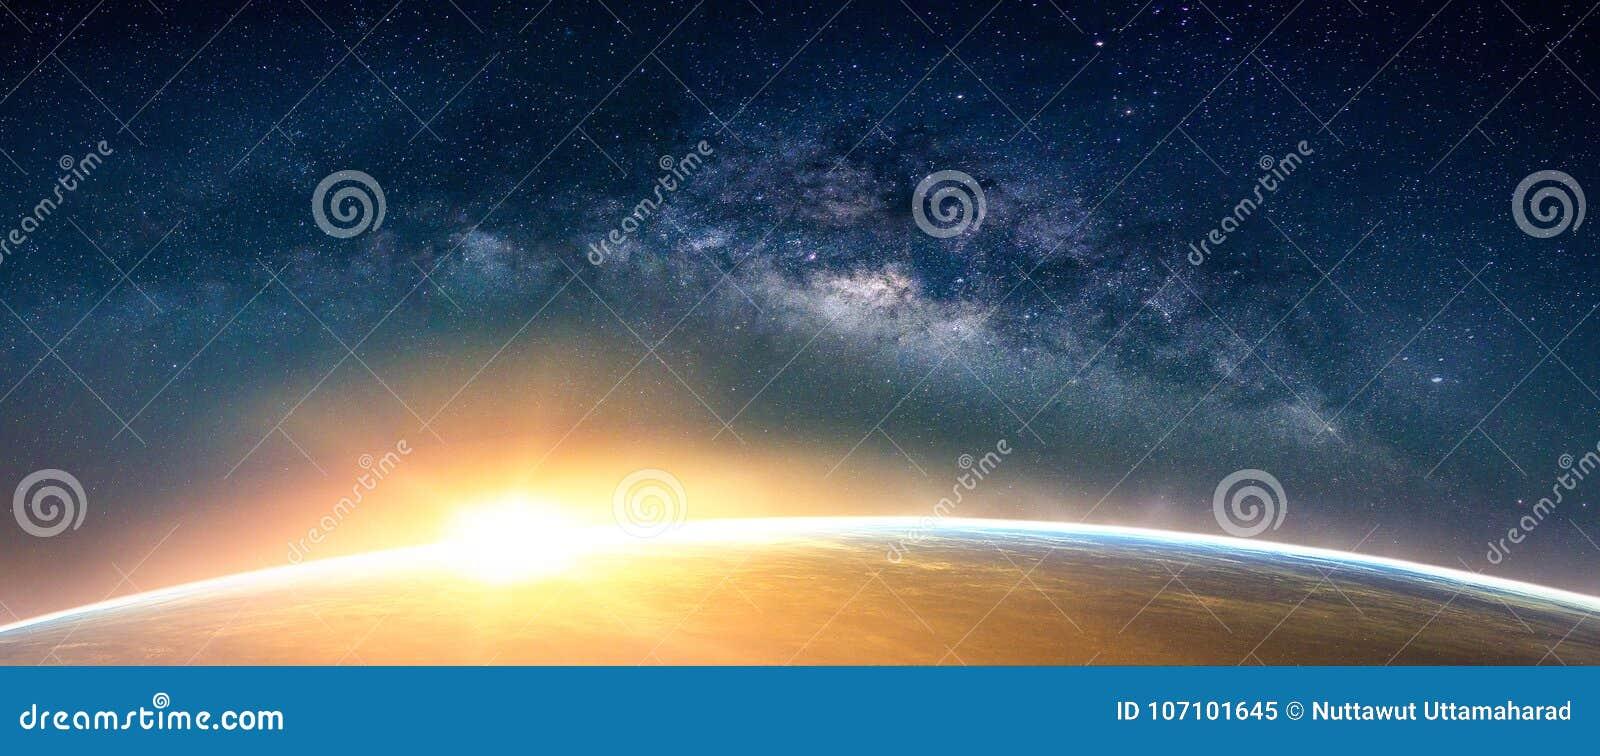 Ландшафт с галактикой млечного пути Взгляд восхода солнца и земли от курорта